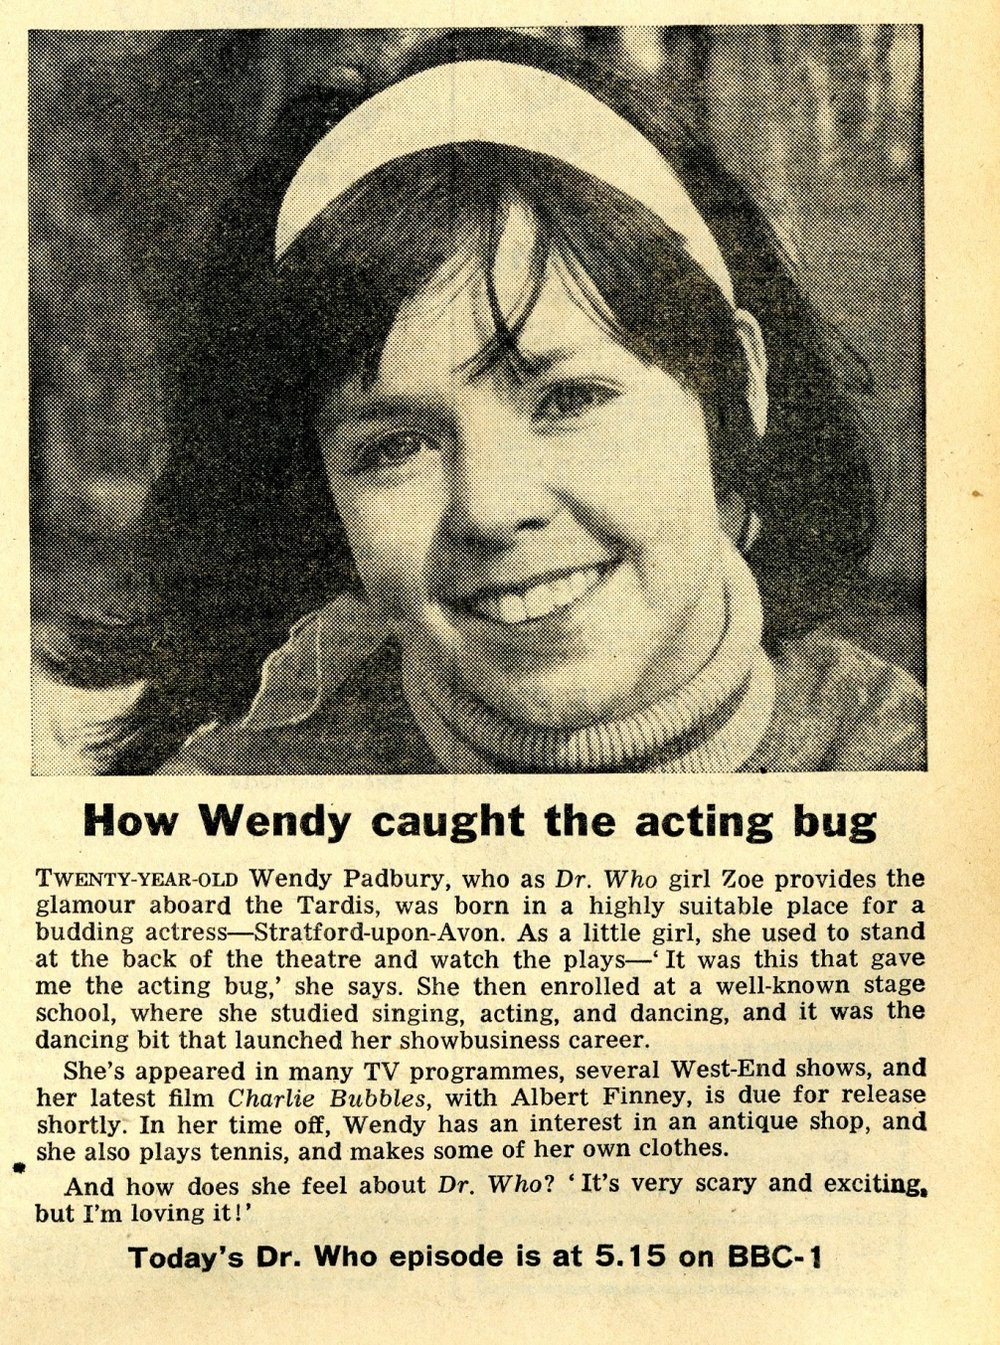 Radio Times, 31 August - 6 September 1968